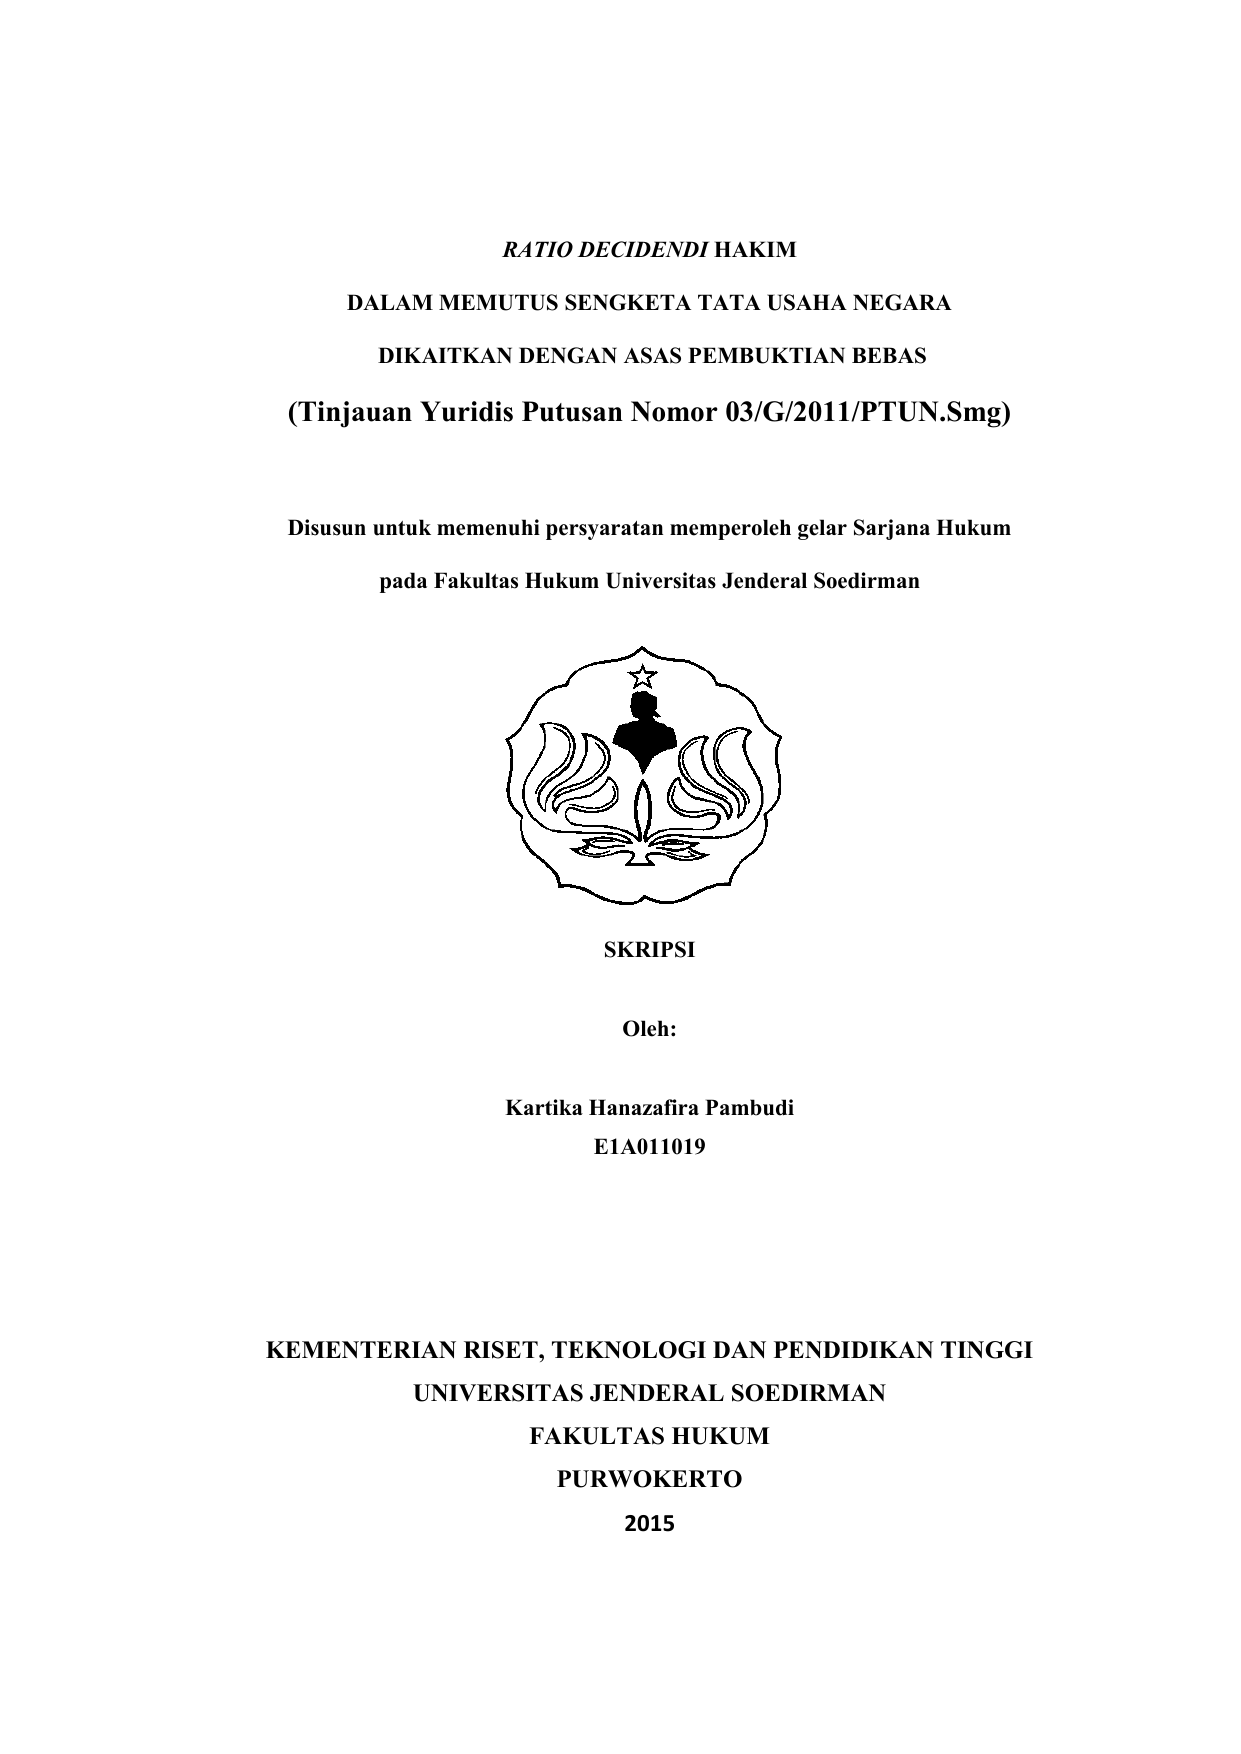 Skripsi Kartika Hanazafira Pambudi